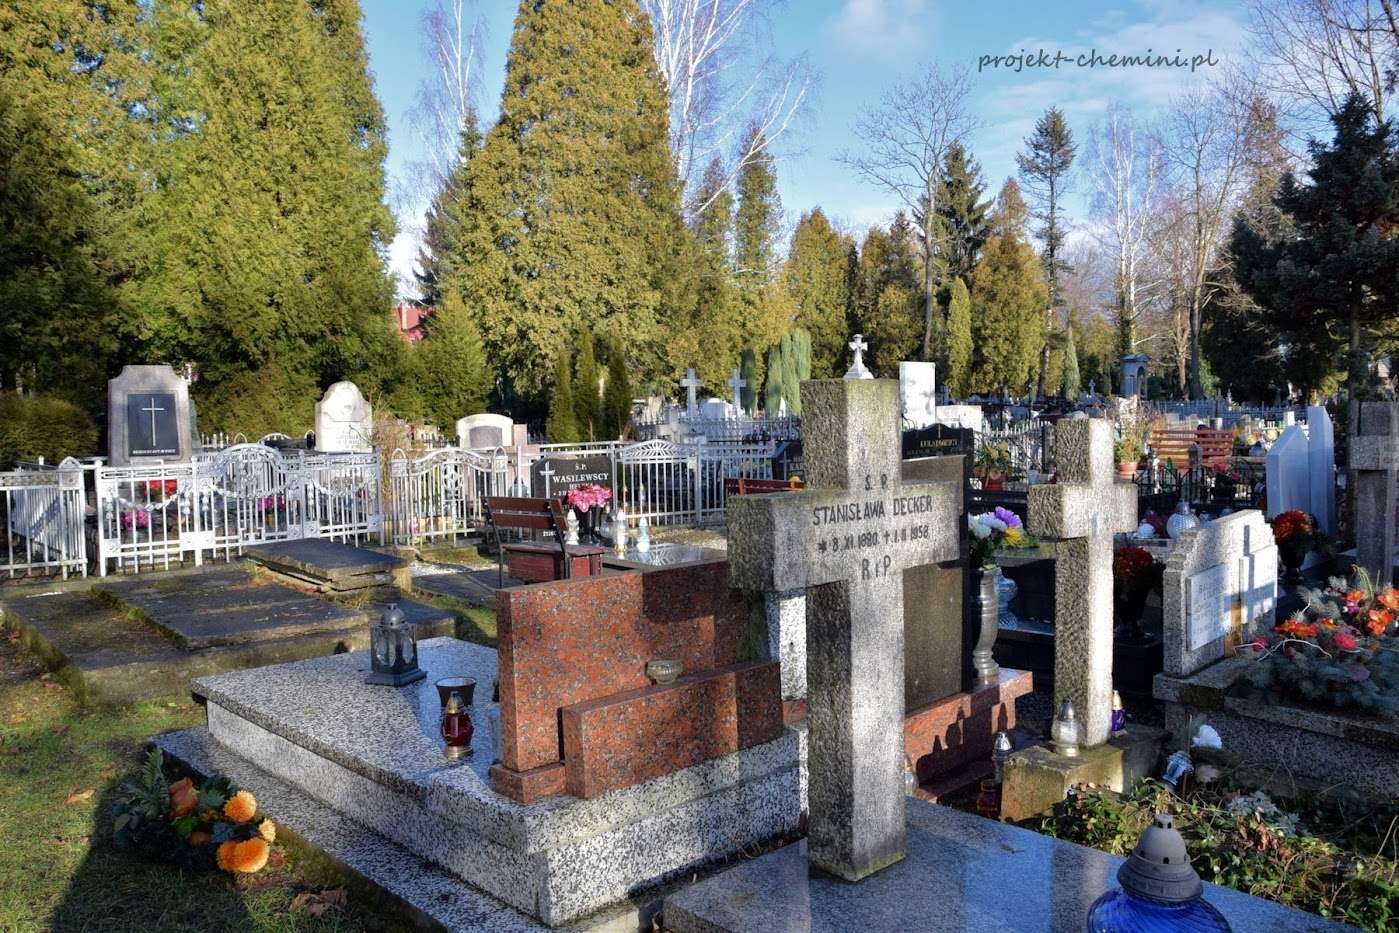 Cmentarz parafialny, ul. Jagiellońska